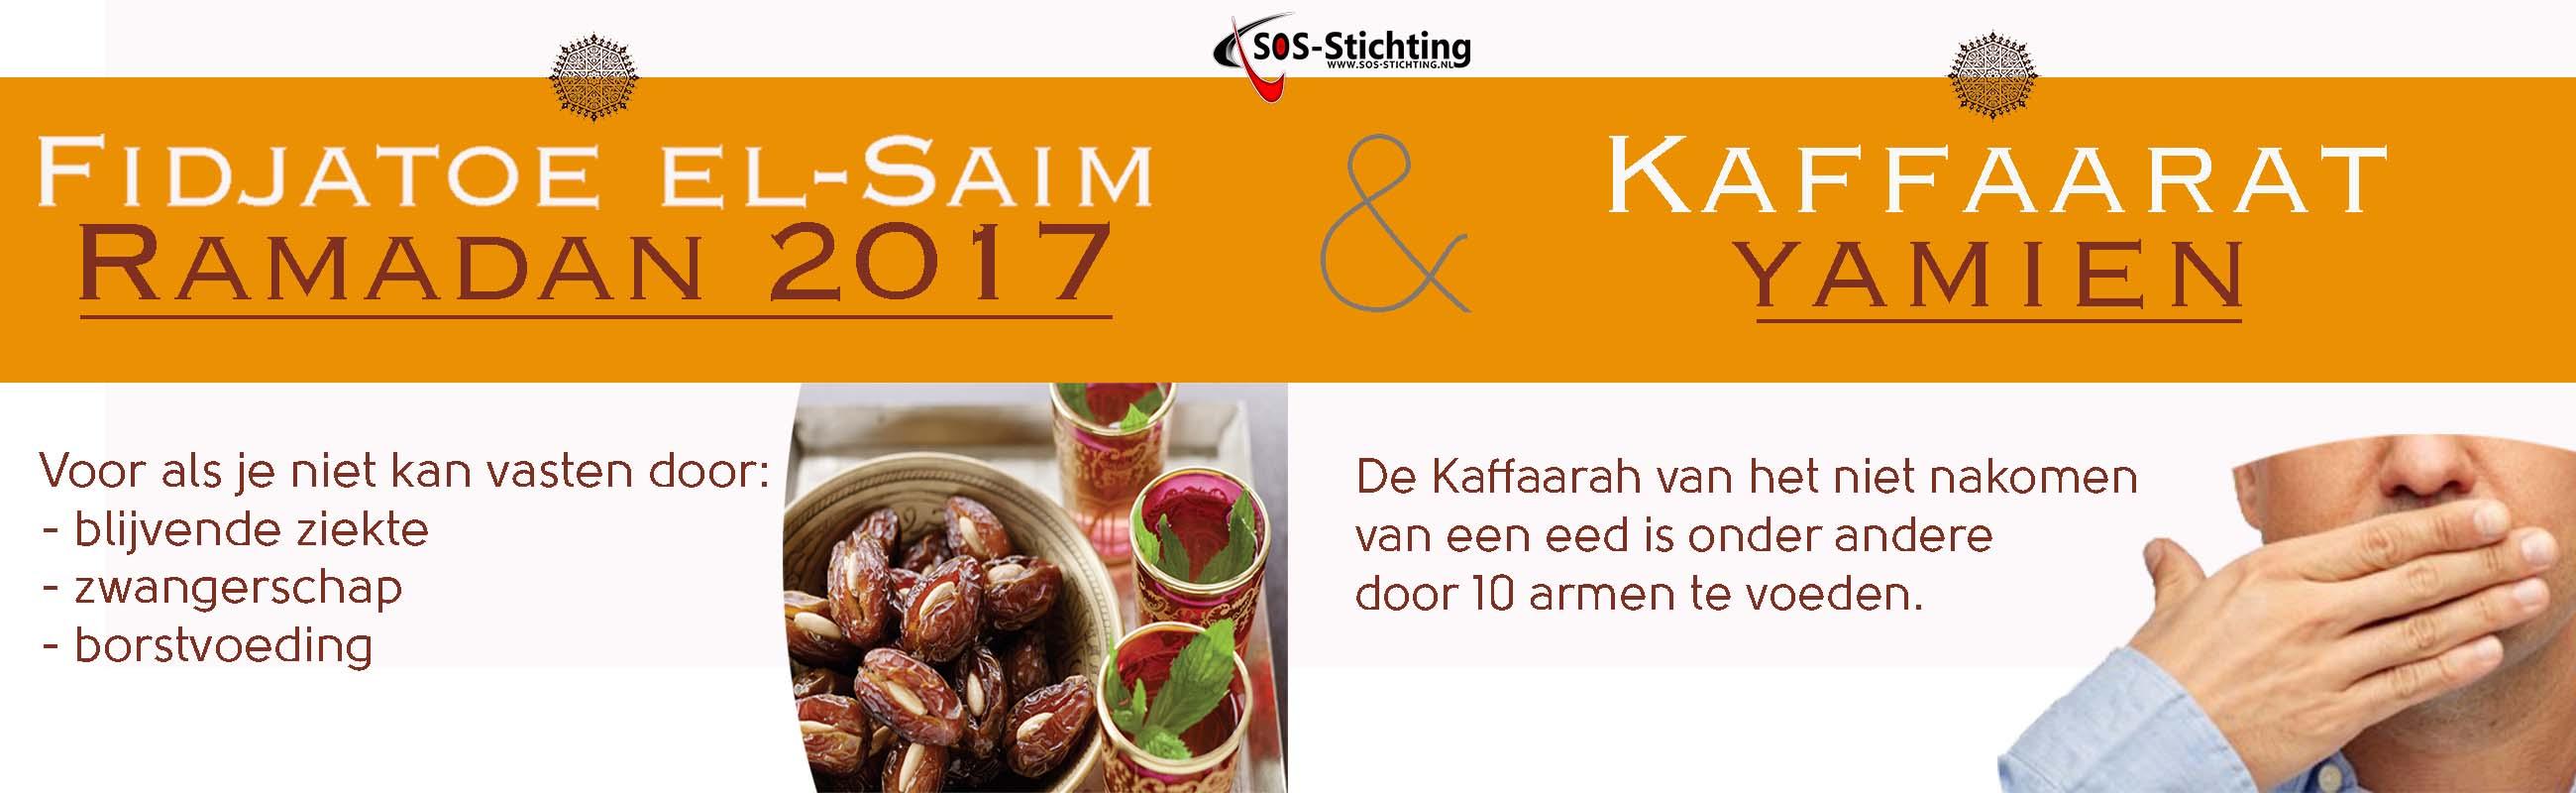 Banner Fidjatoe elsaim Kaffaarat yamien 2017 nieuwe site